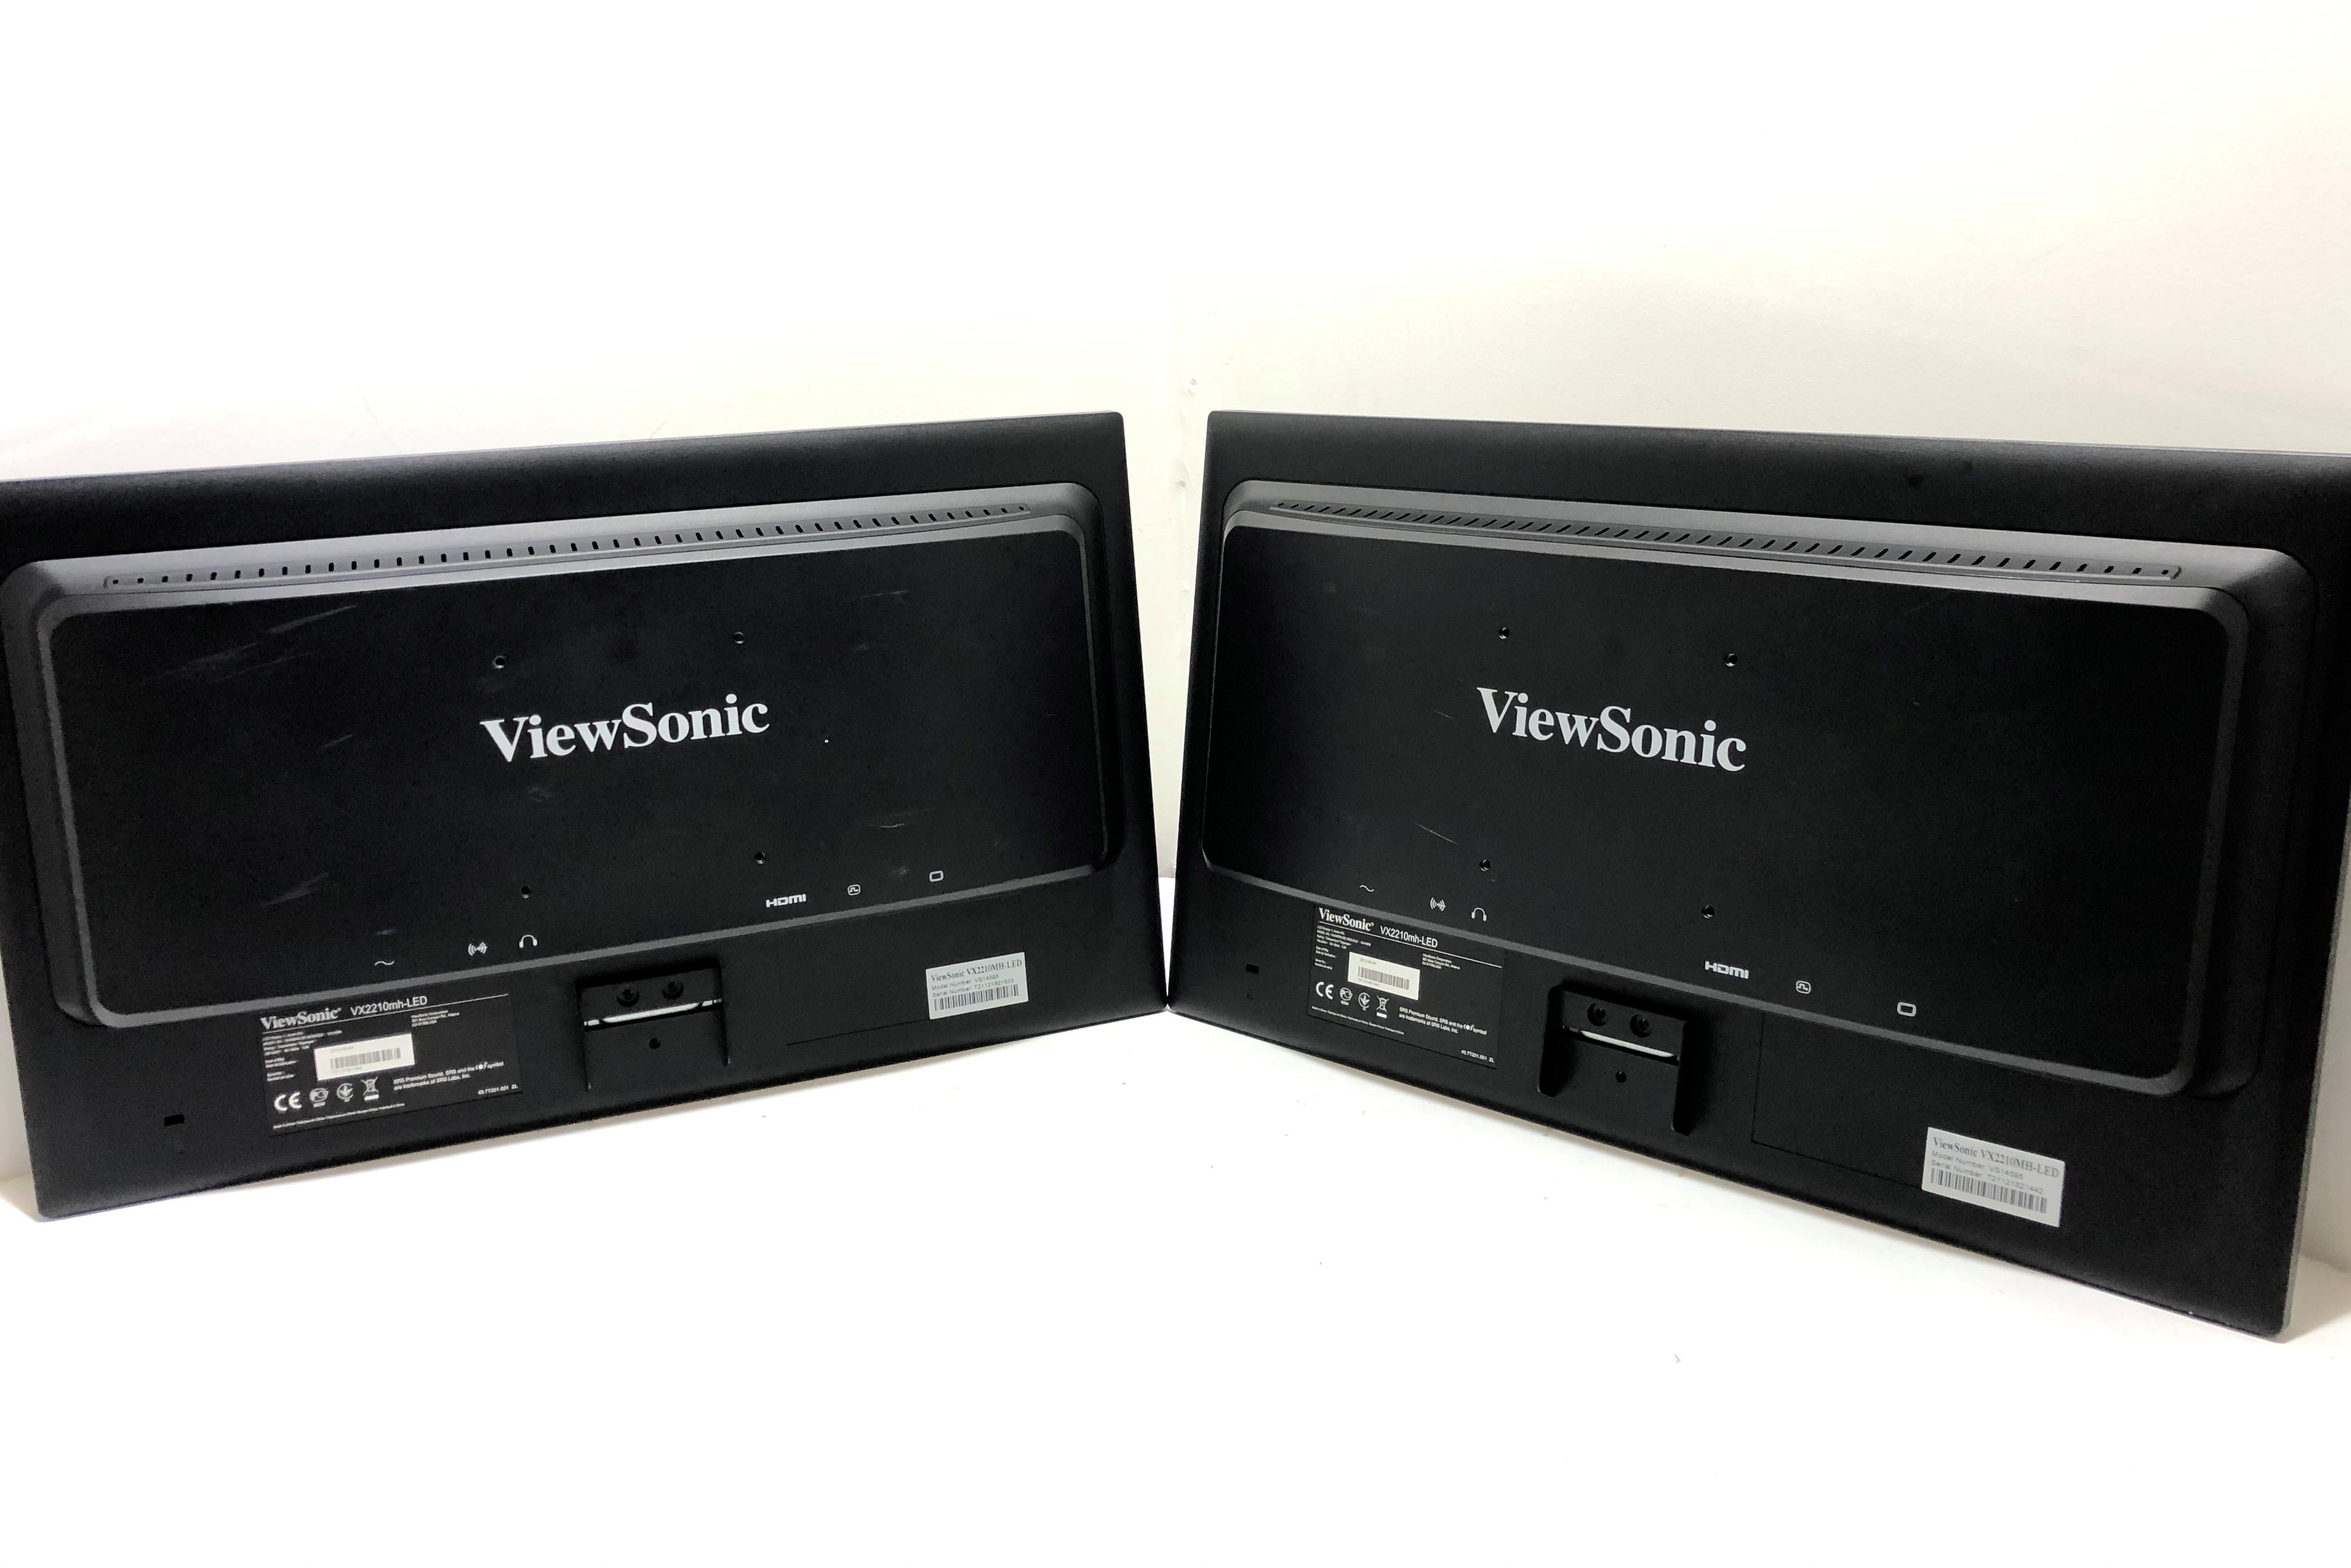 Viewsonic VX2210MH-LED No 2